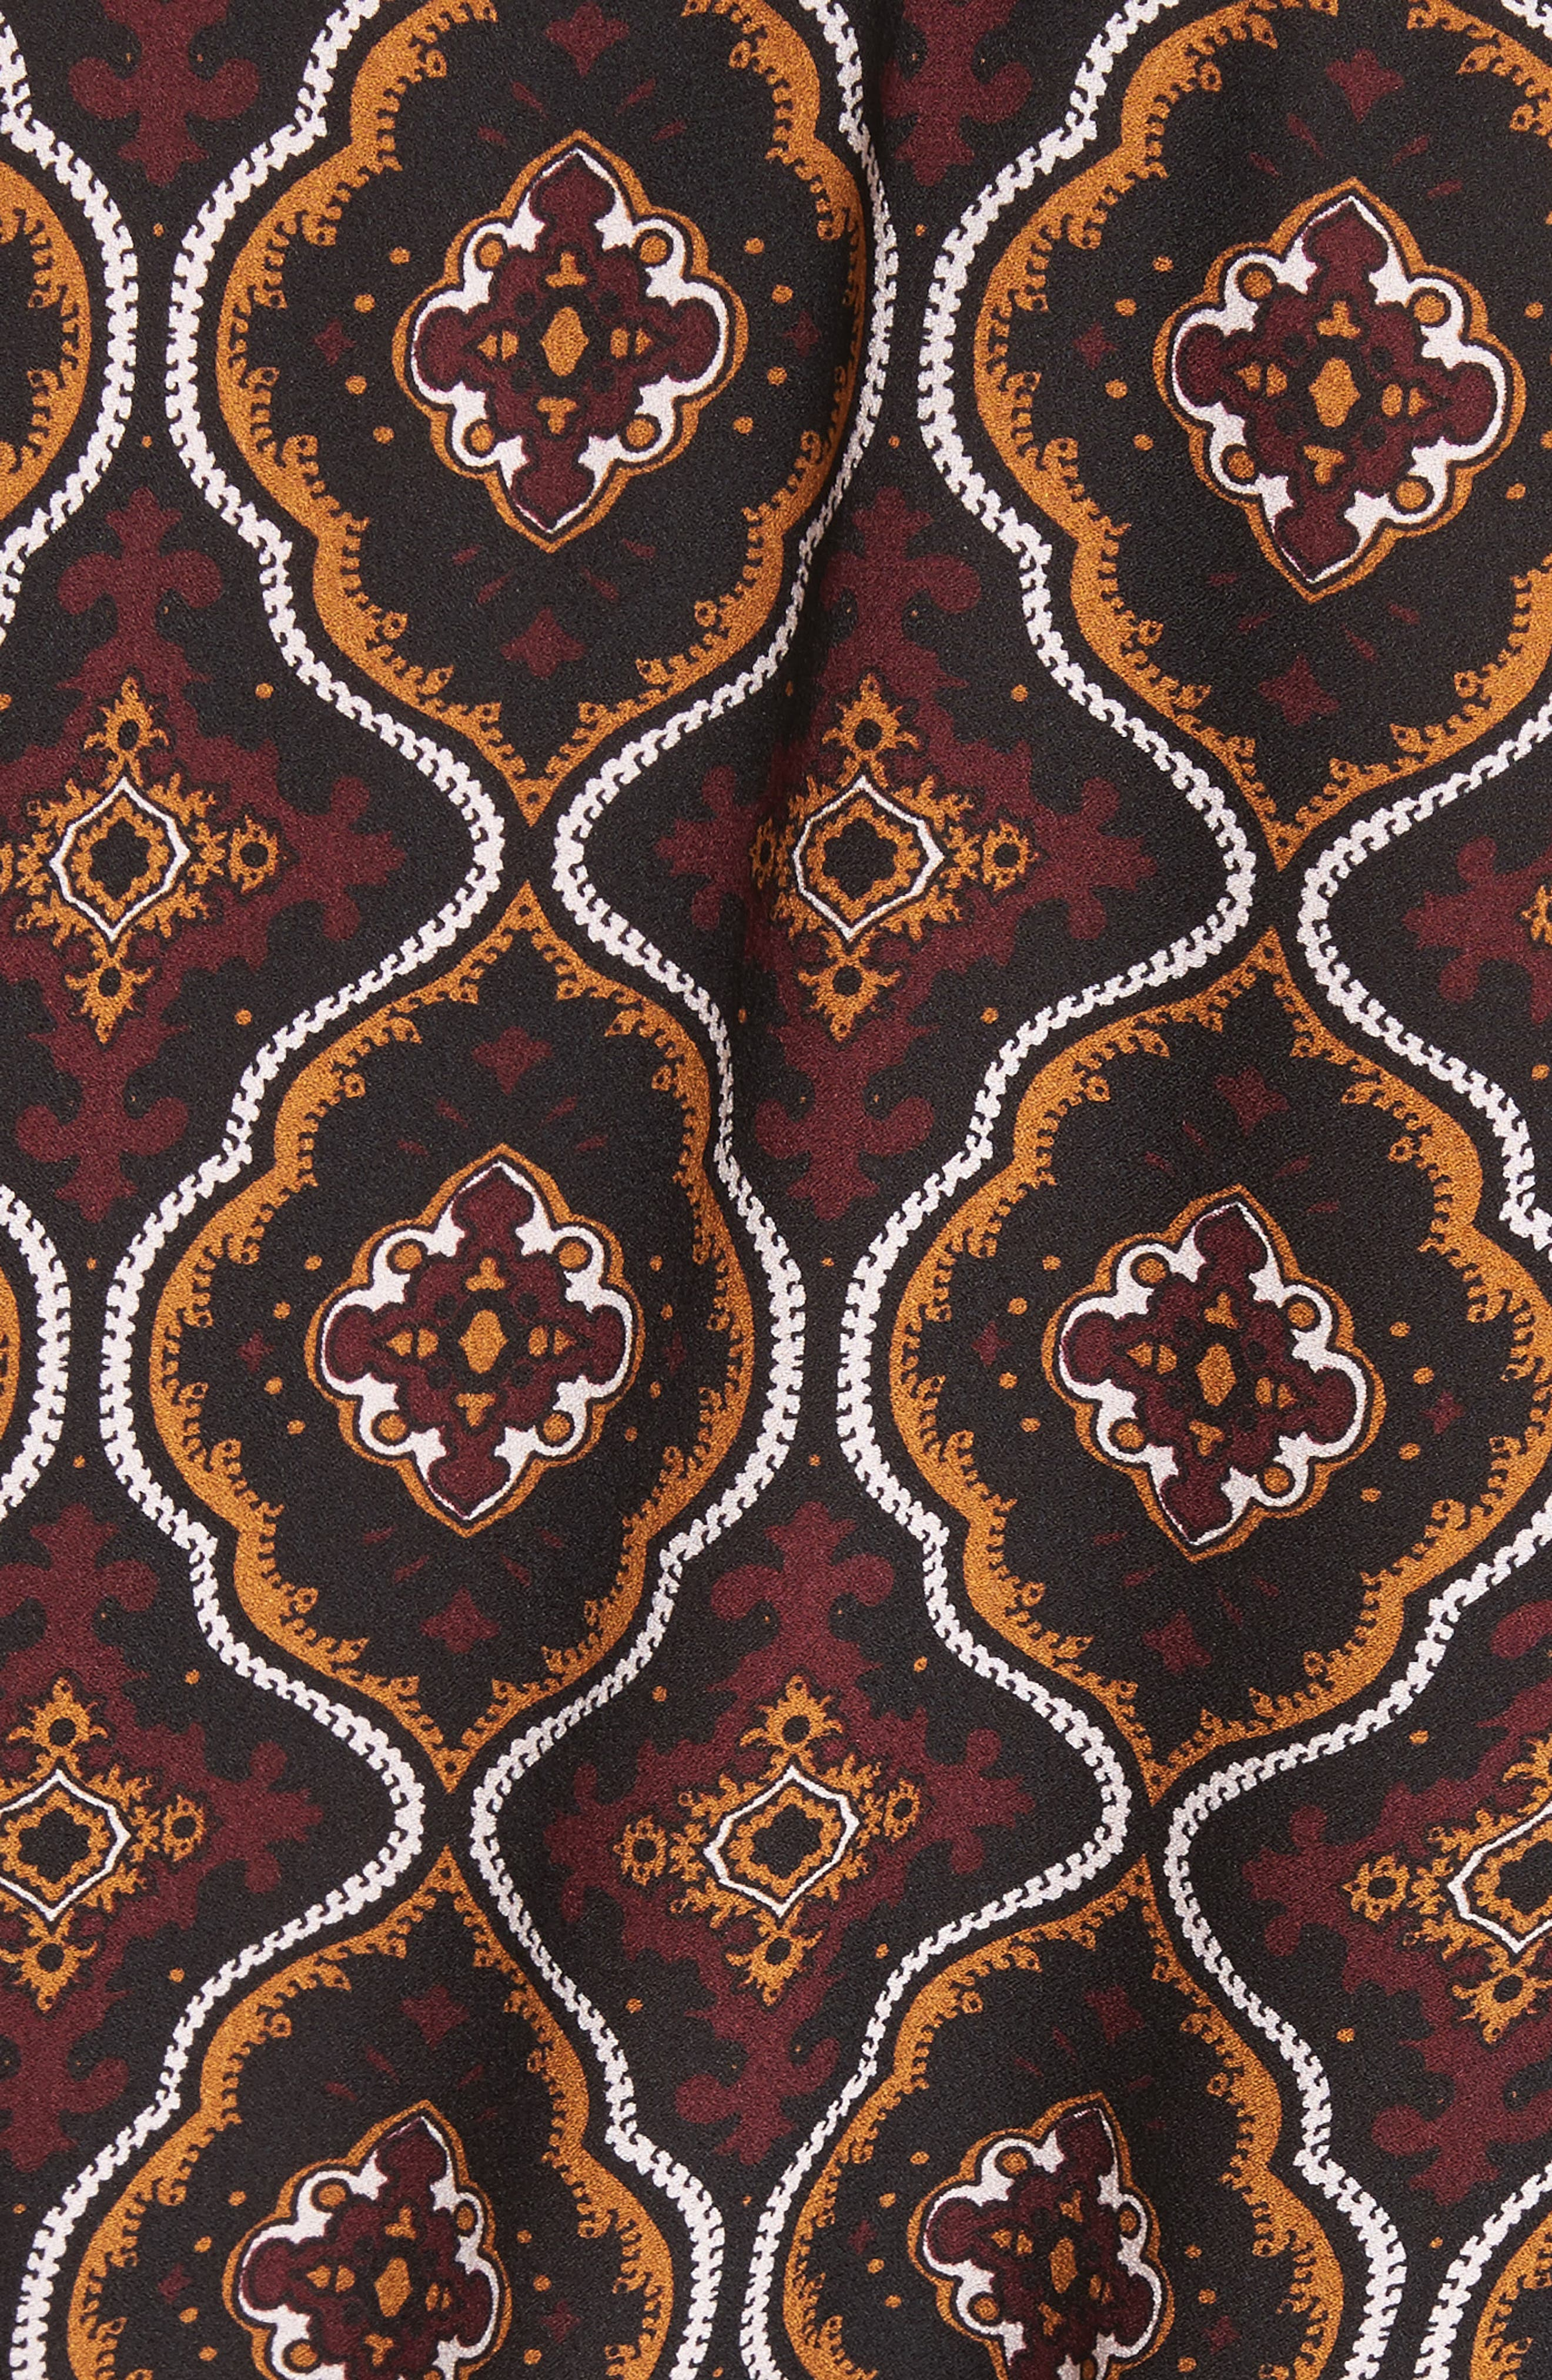 Aubrey Print Silk Top,                             Alternate thumbnail 6, color,                             Burgundy/ Gold Multi